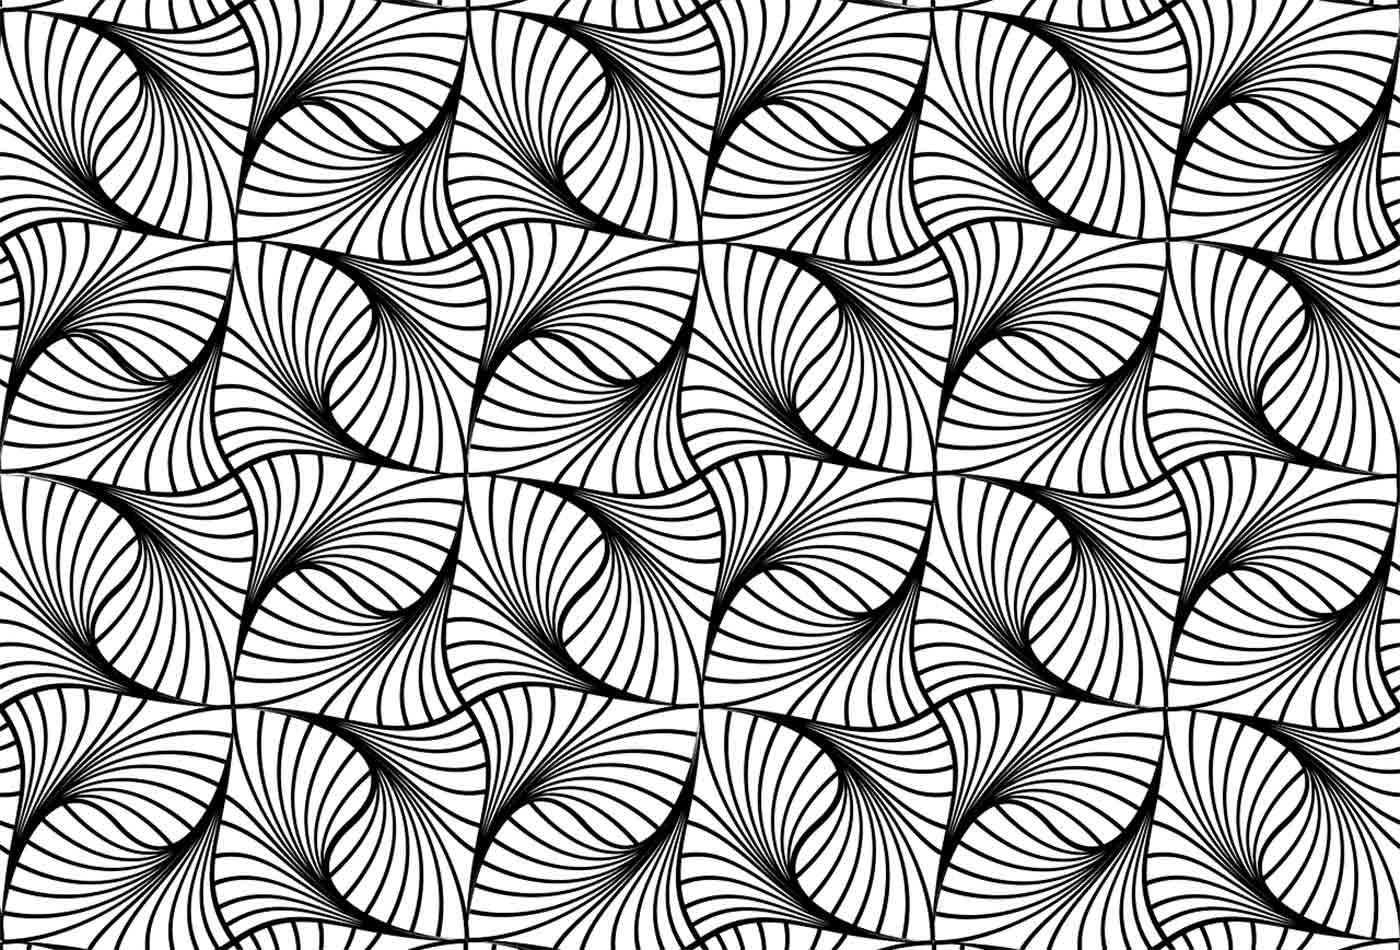 Seamless abstract